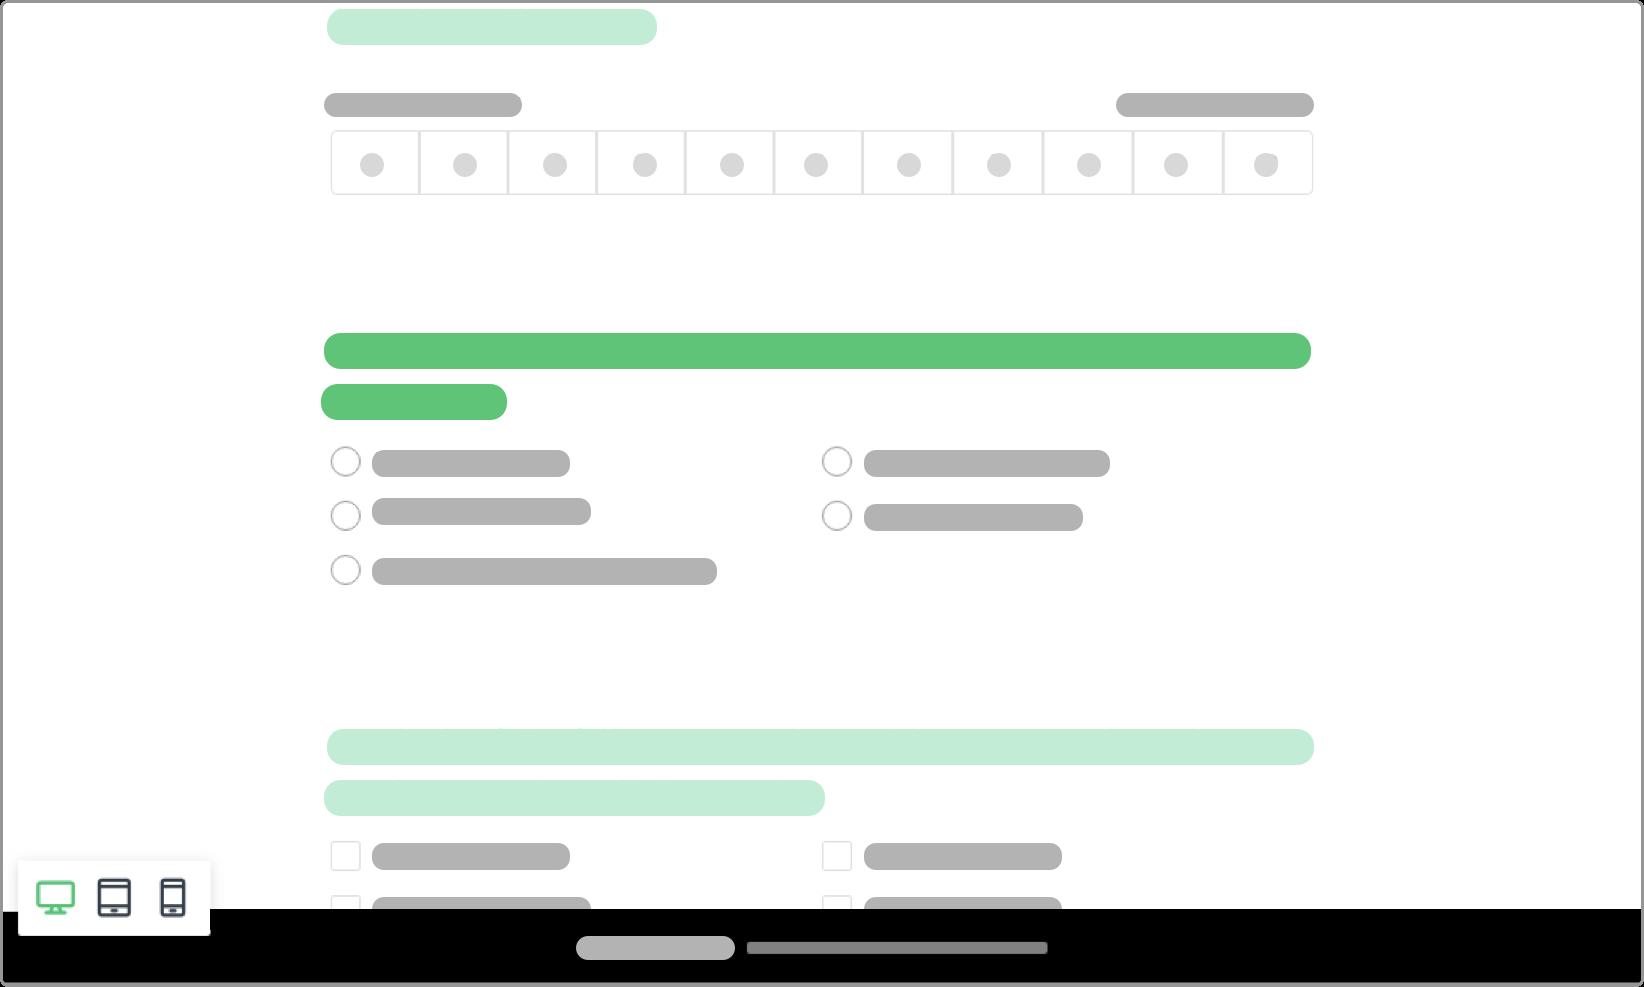 Switch to SurveySparrow, the SurveyMonkey alternative with a sleek interface.